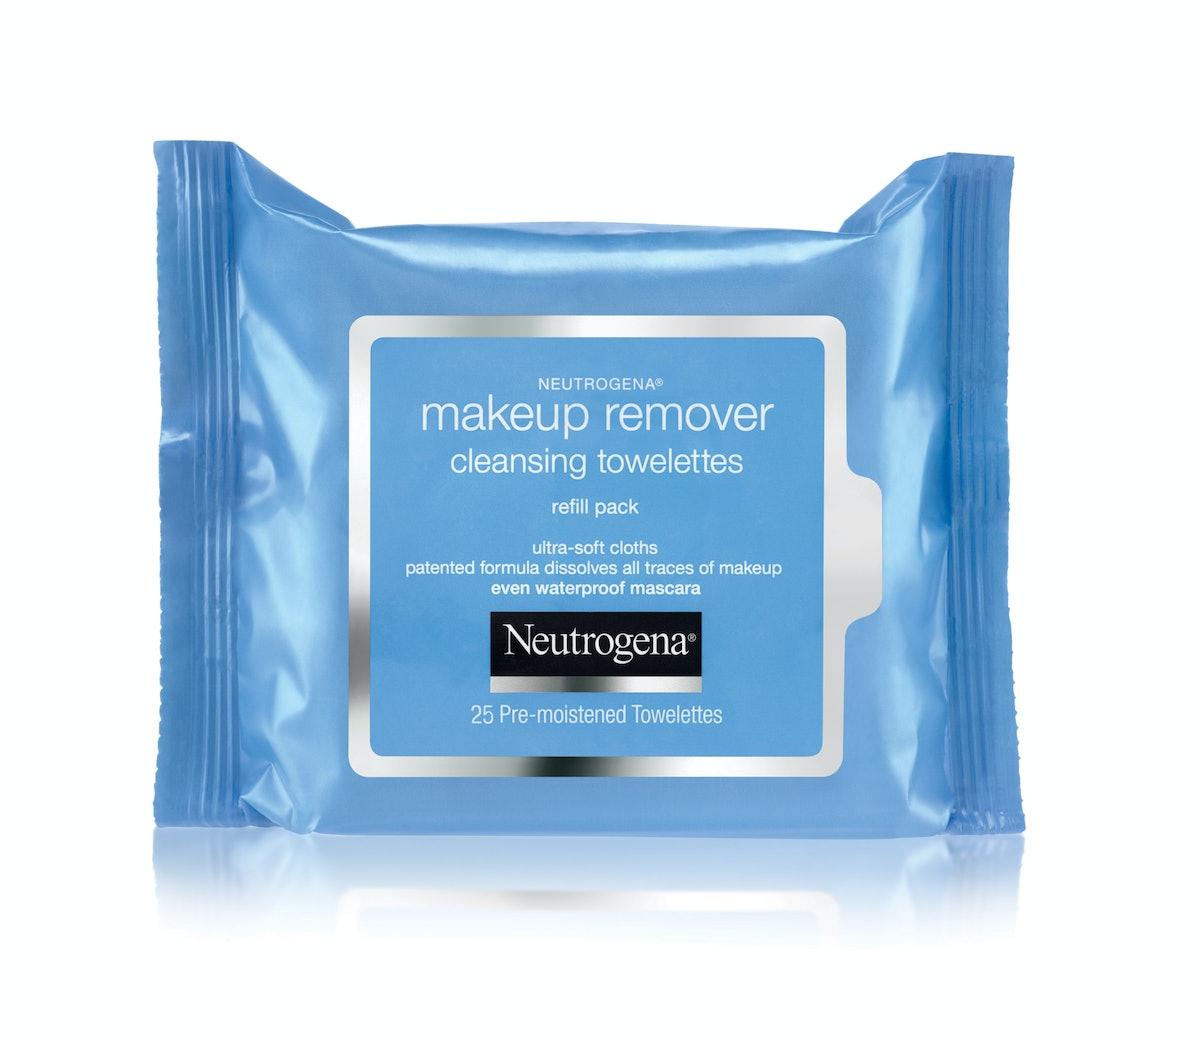 Neutrogena-MUR-Towelettes